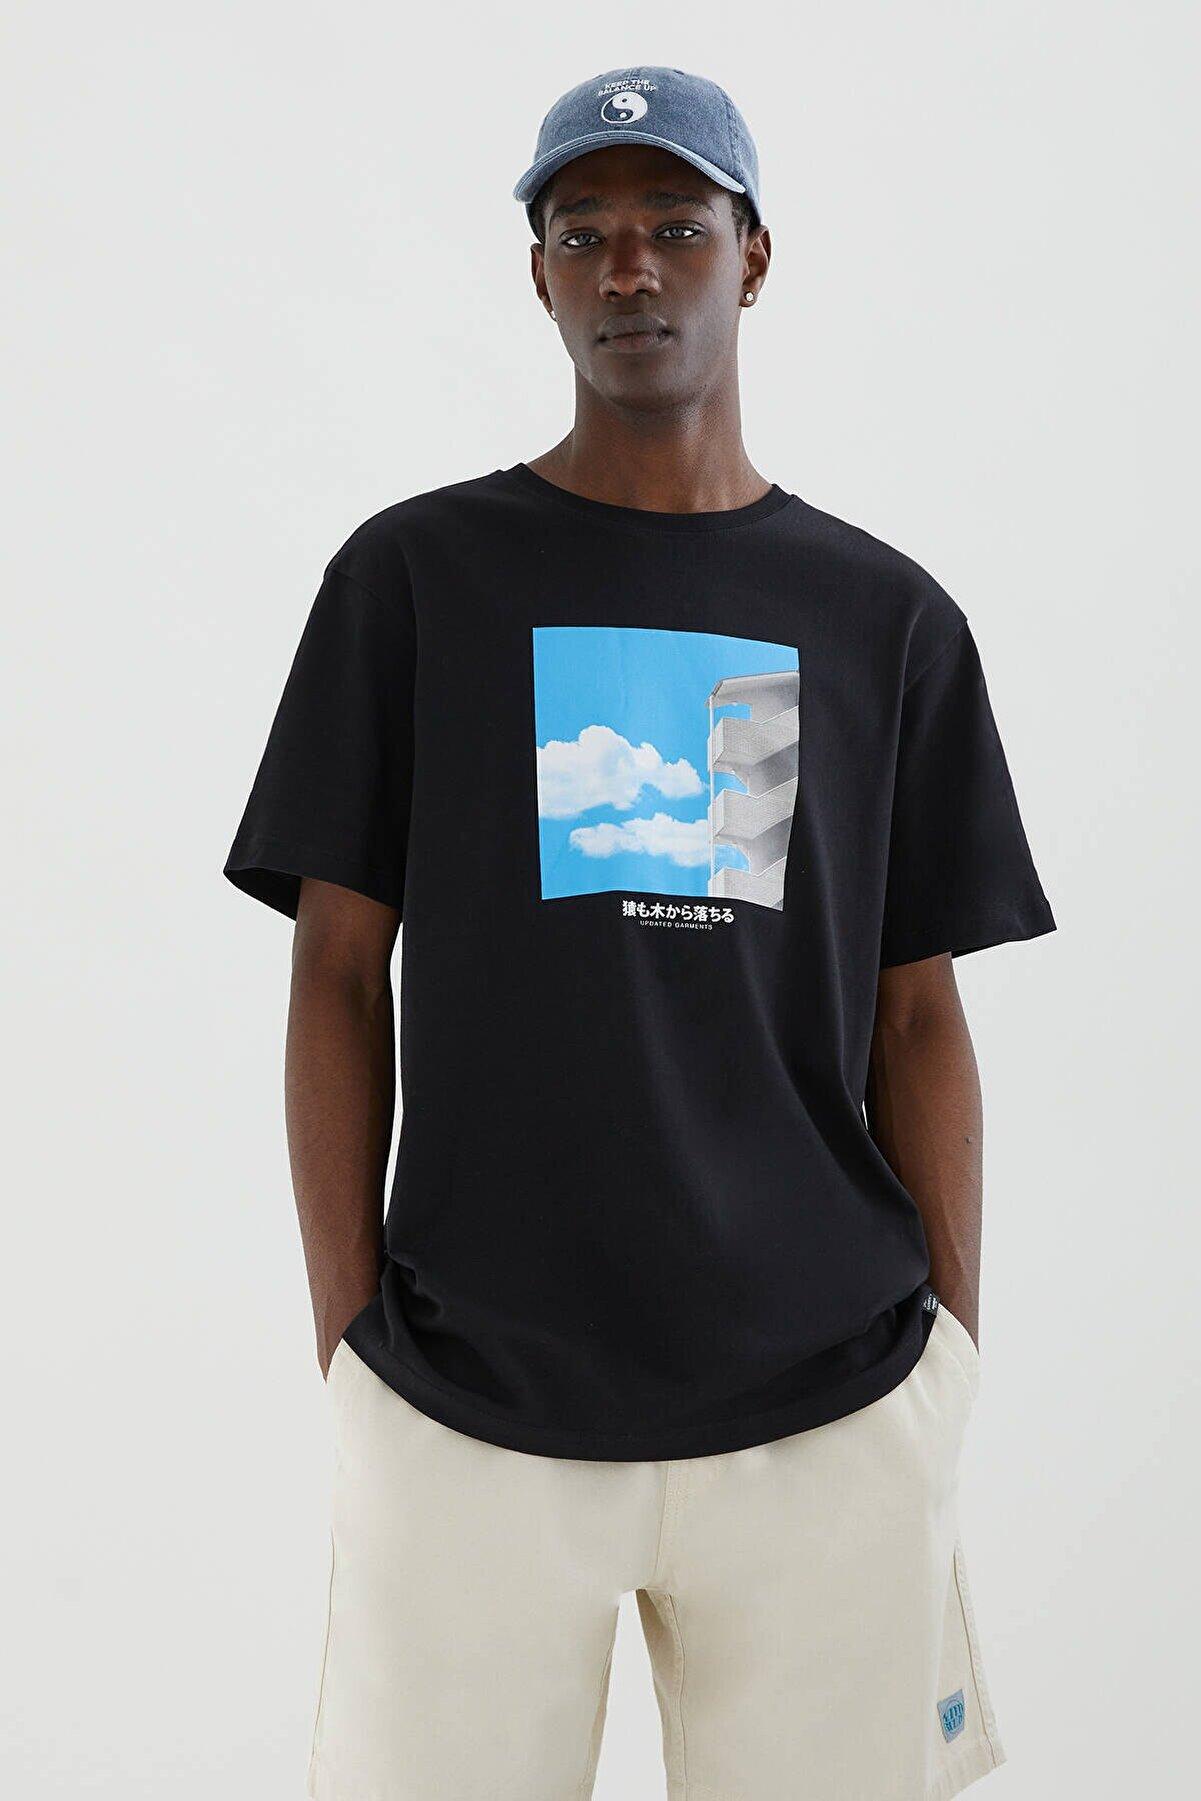 Pull & Bear Bina Fotoğrafı Baskılı Siyah T-Shirt